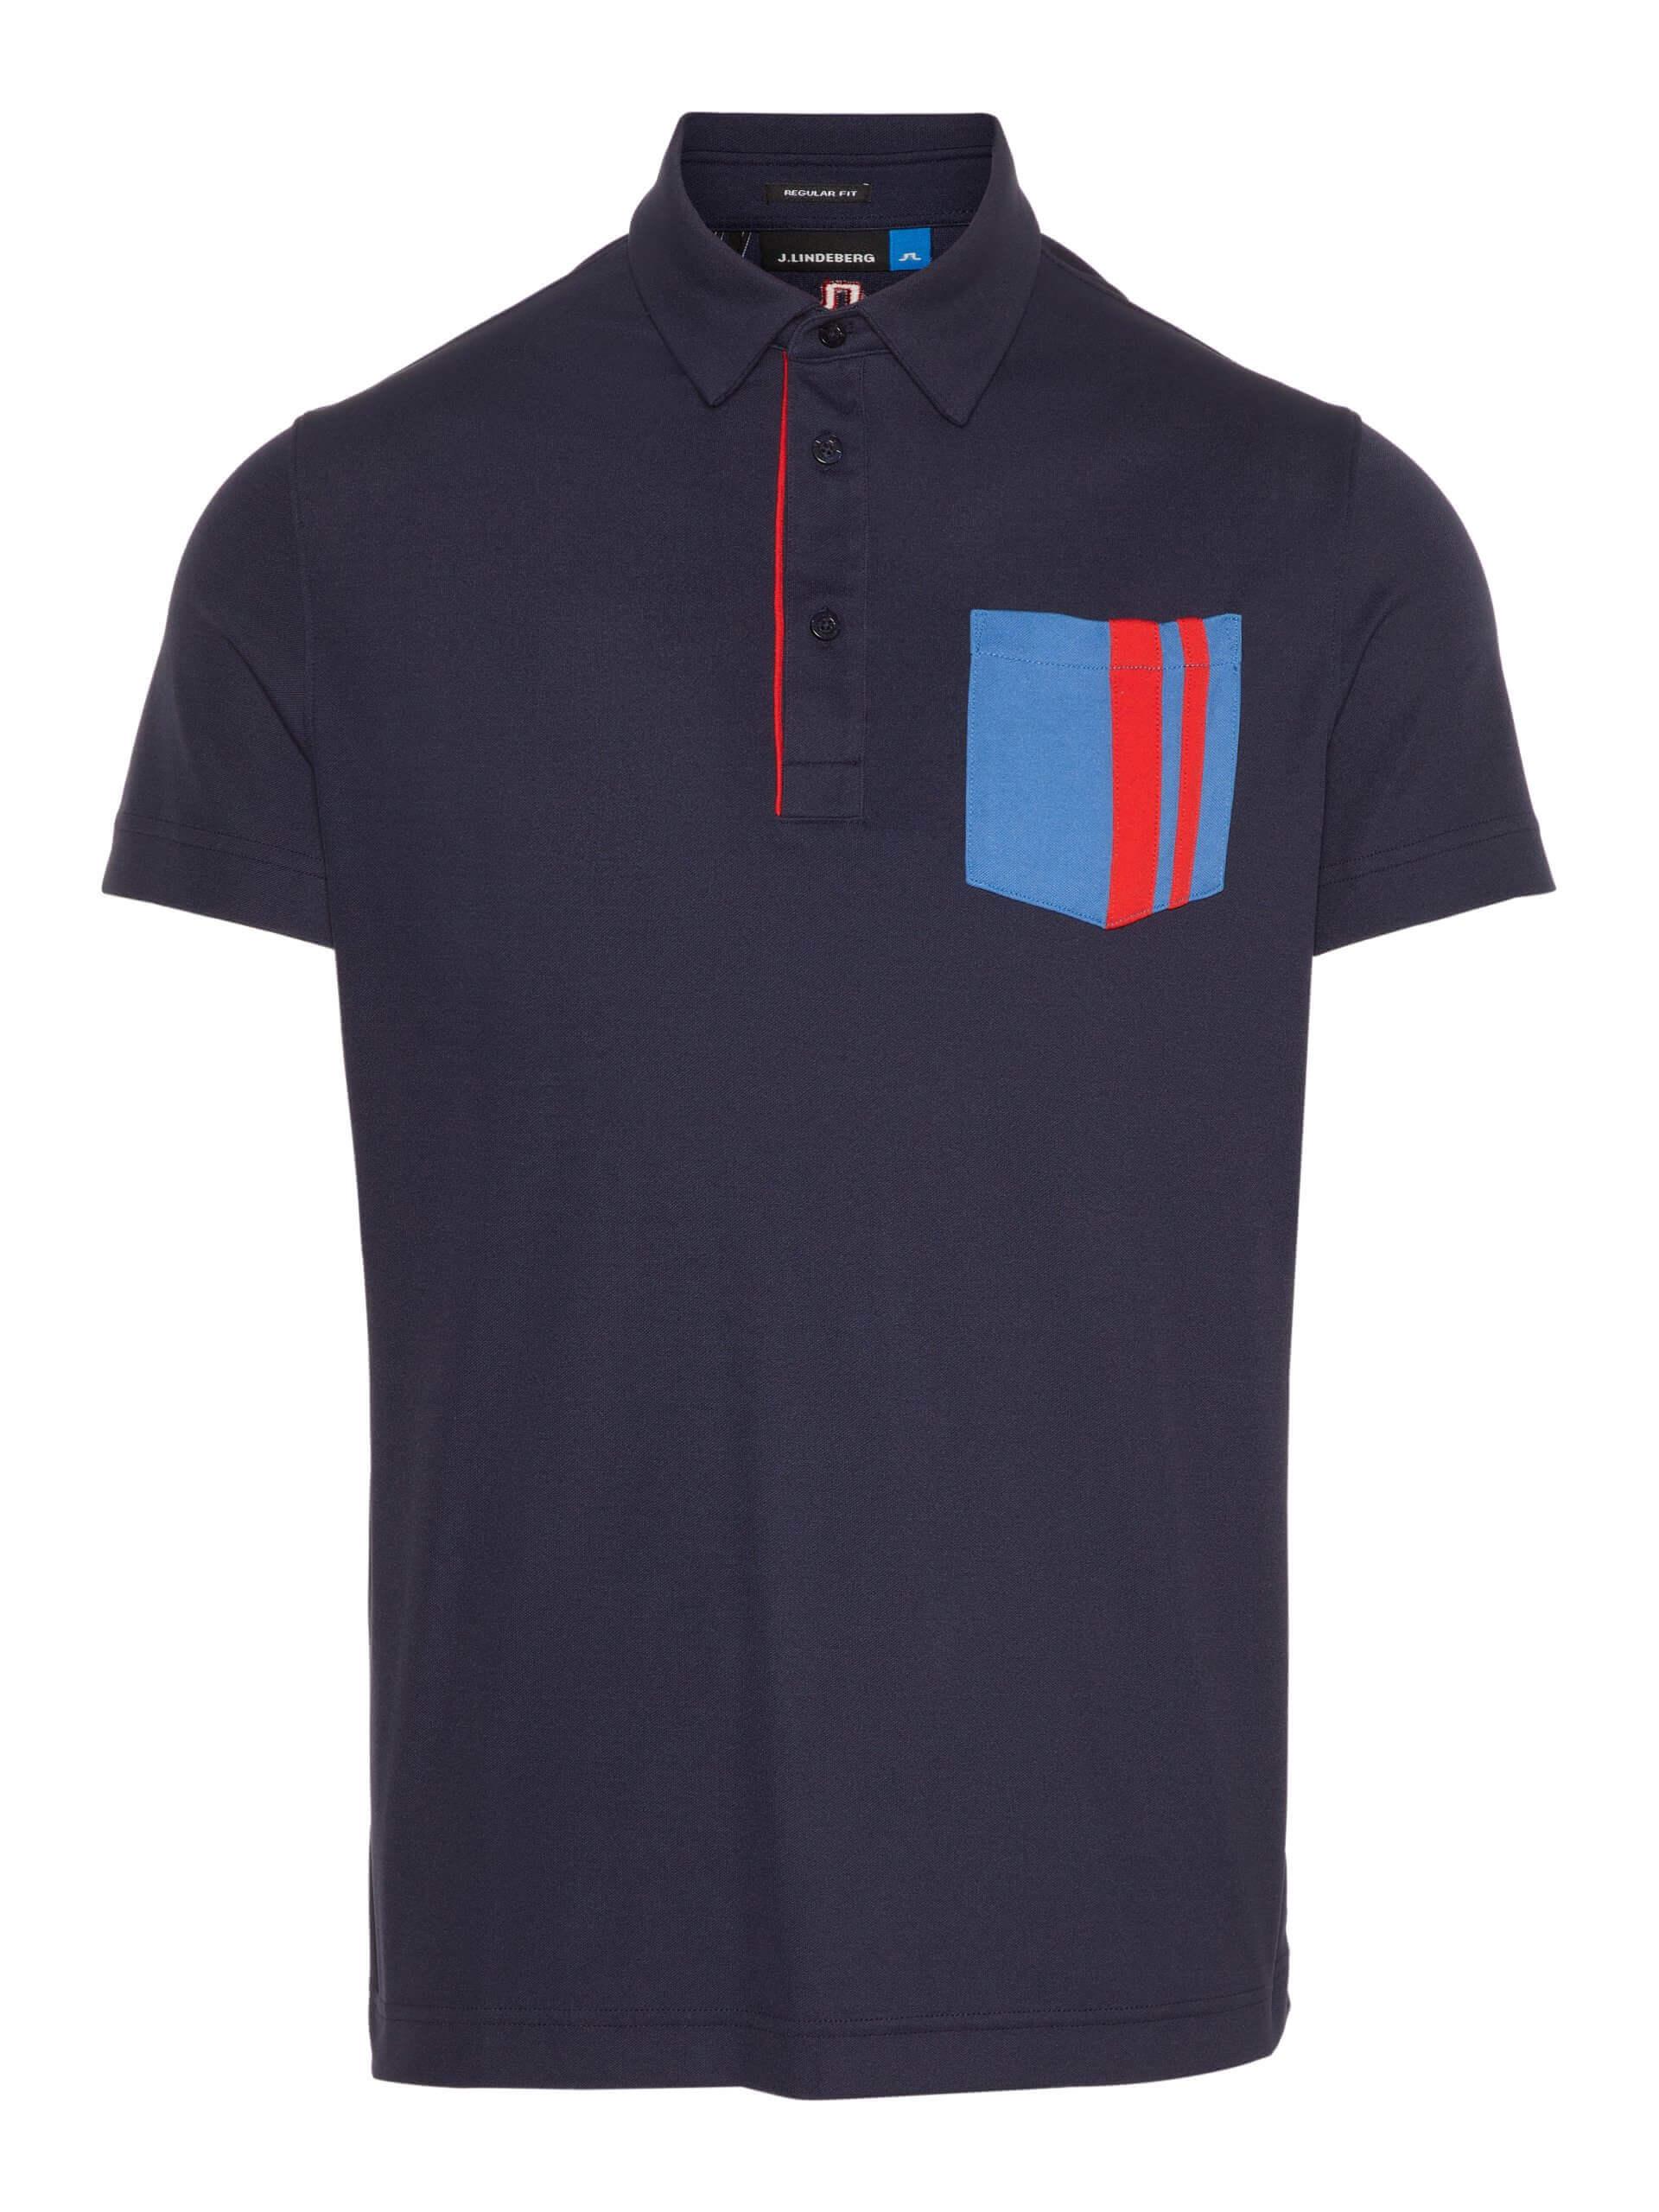 J.Lindeberg - OWEN Reg LUX Pique in navy with blue & red front pocket